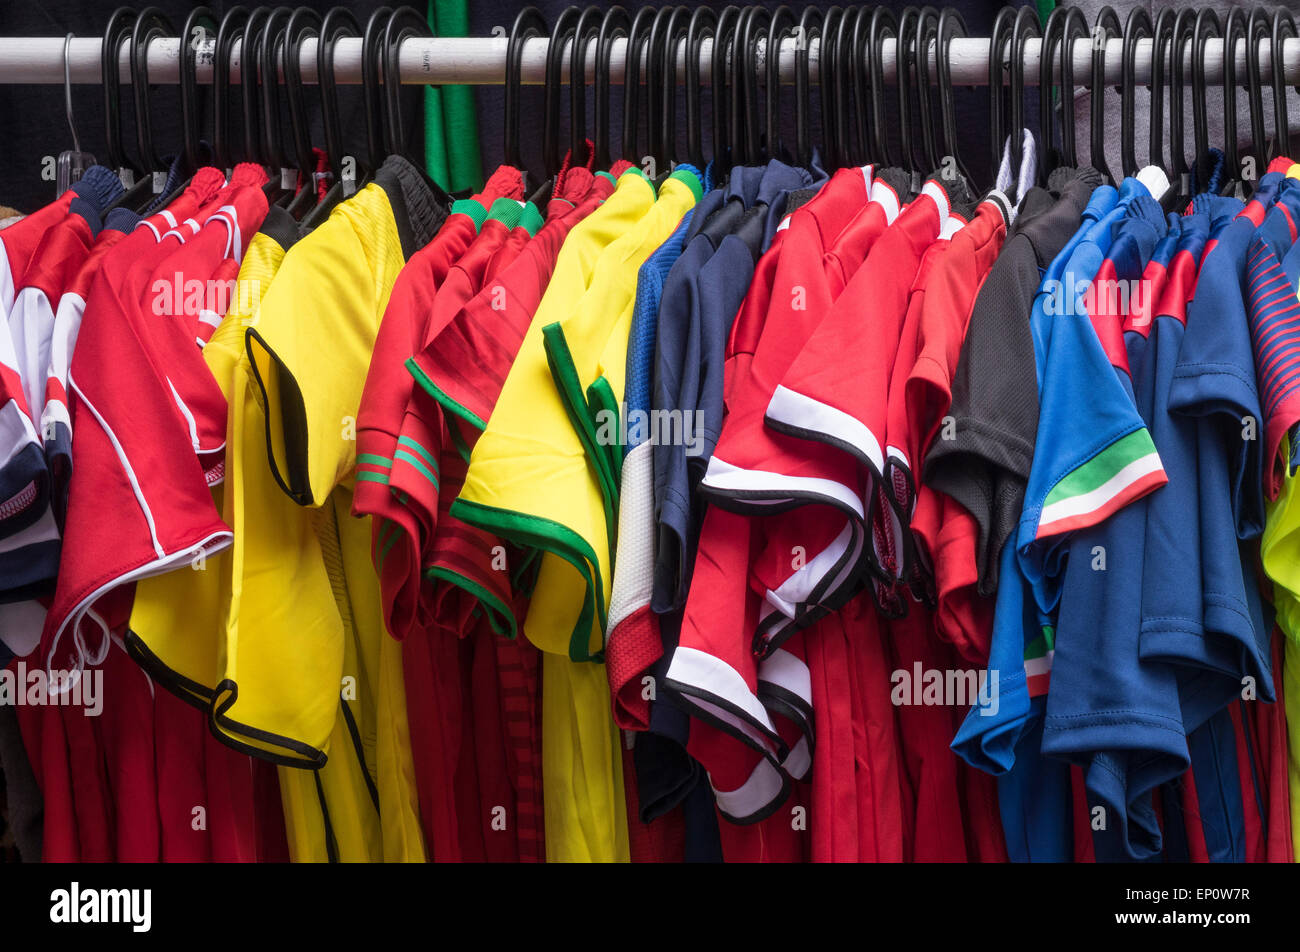 football jerseys for sale